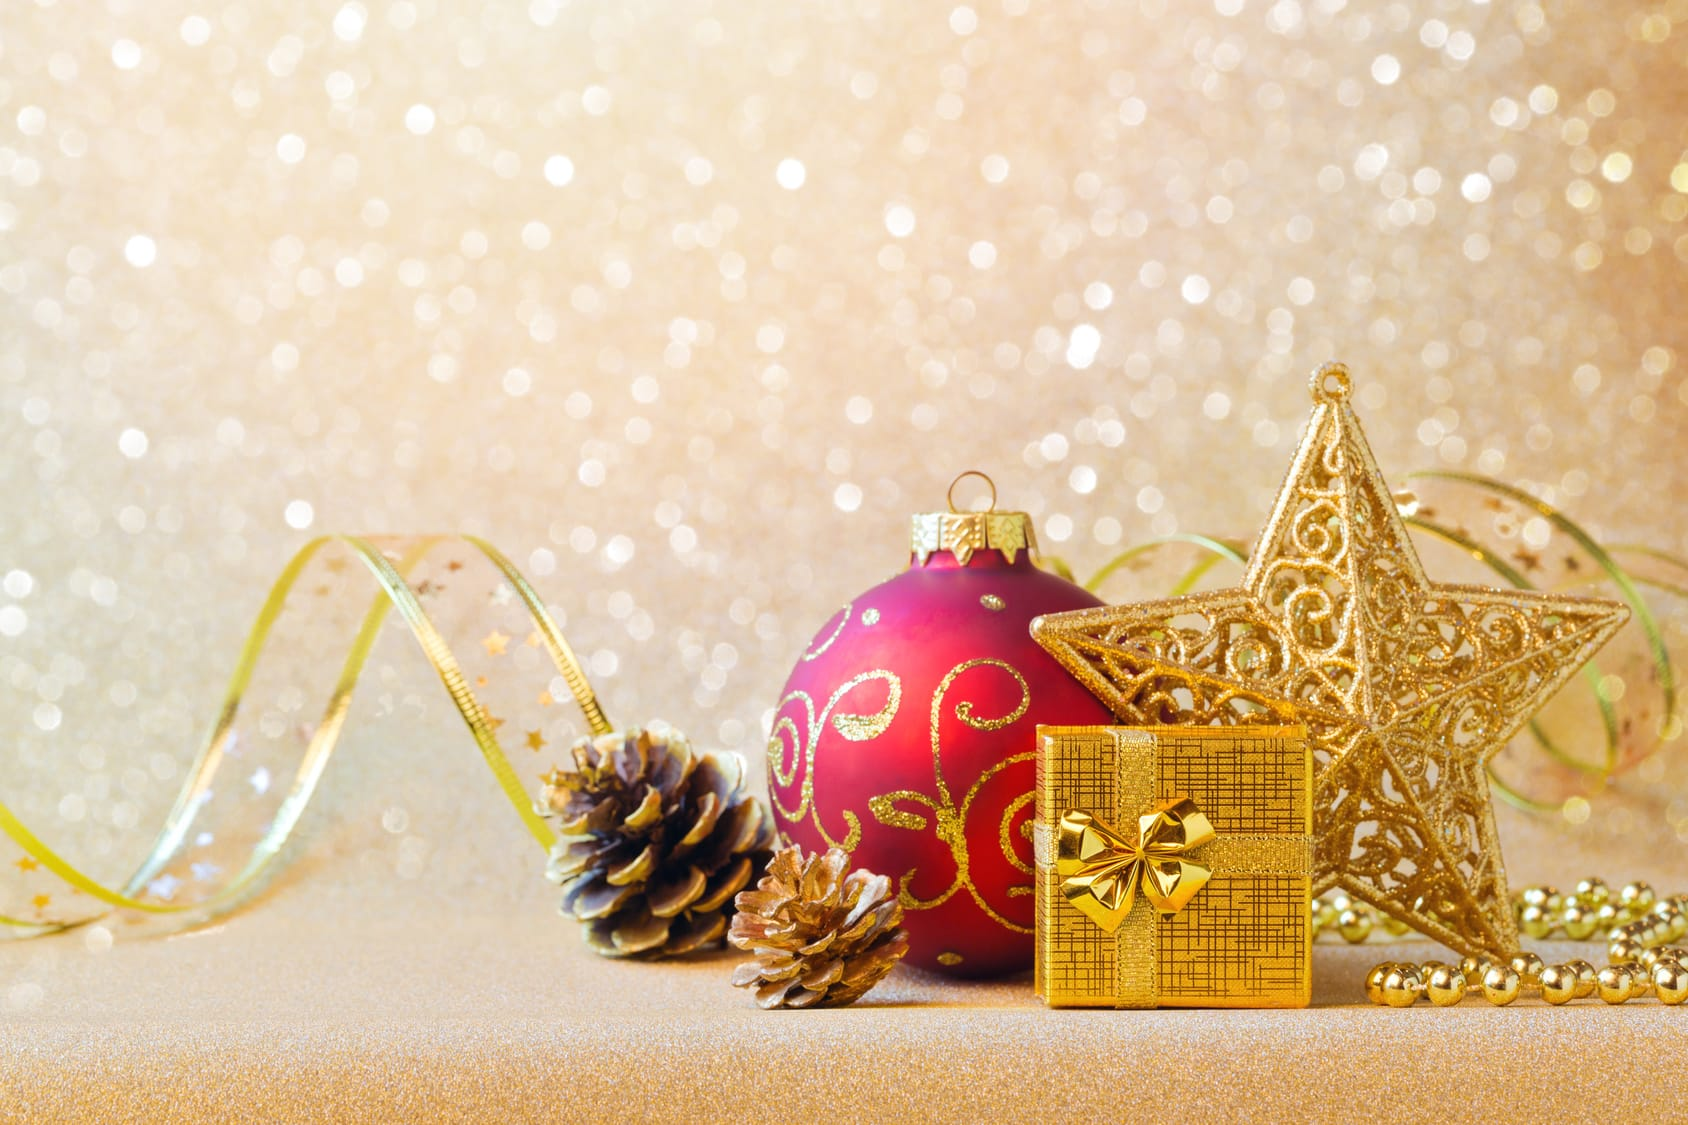 Mortgage Banker Realtor Client Gifts